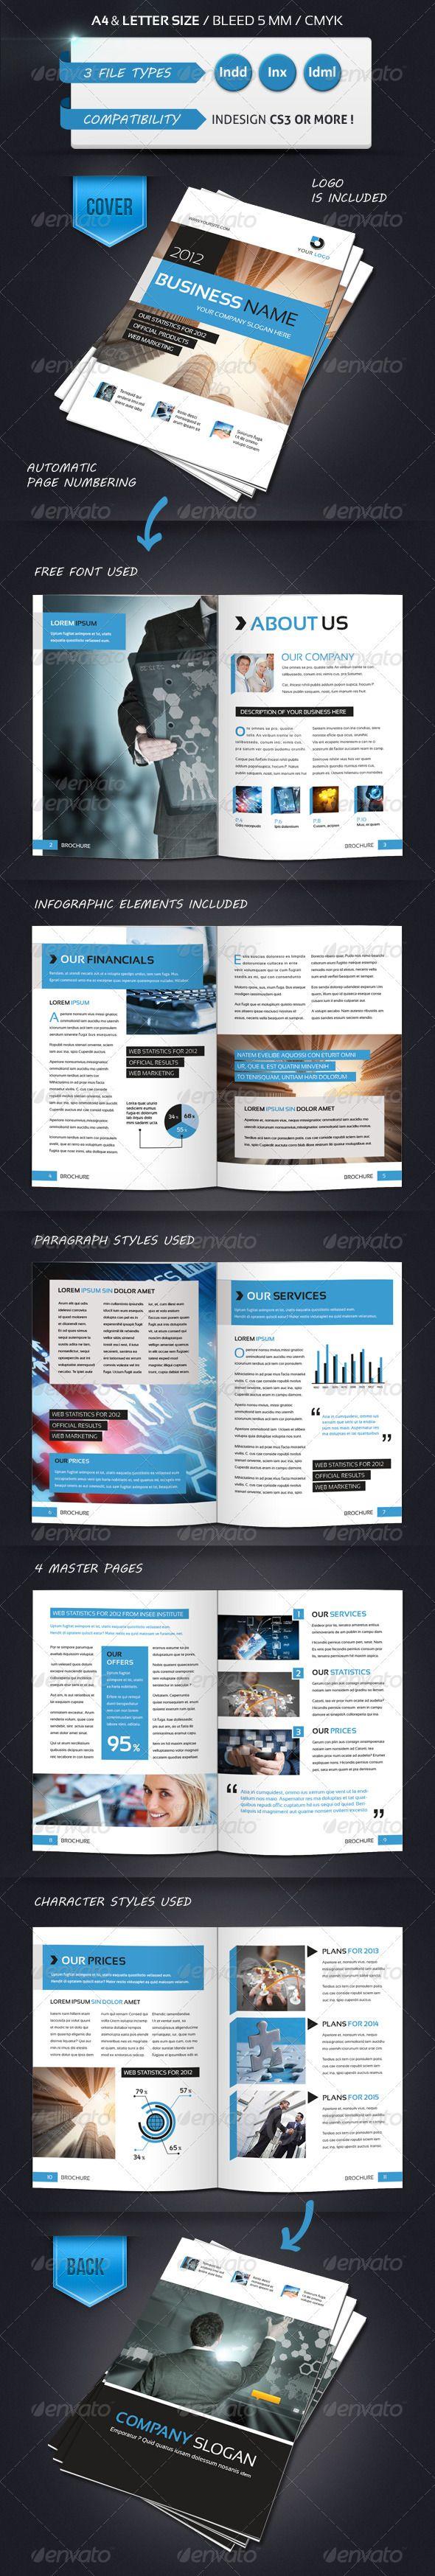 Best Brochure Templates Images On Pinterest Brochure - Brochure template for pages